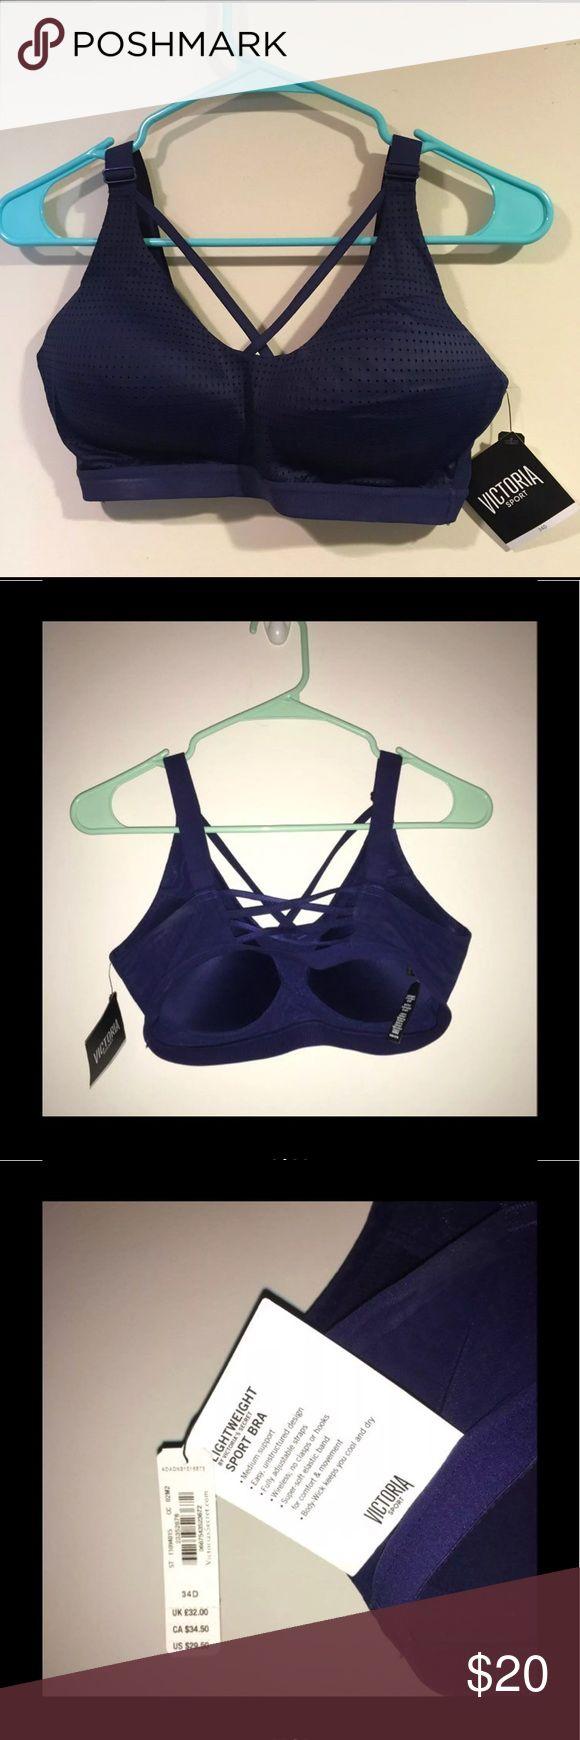 NWTs VS Sports Bra (34D) New with tags.  34D. Navy blue. No holds. Retails for $29.5 Bundle and save.  #vs #sportsbra #34d #victoriassecret #sport Victoria's Secret Intimates & Sleepwear Bras